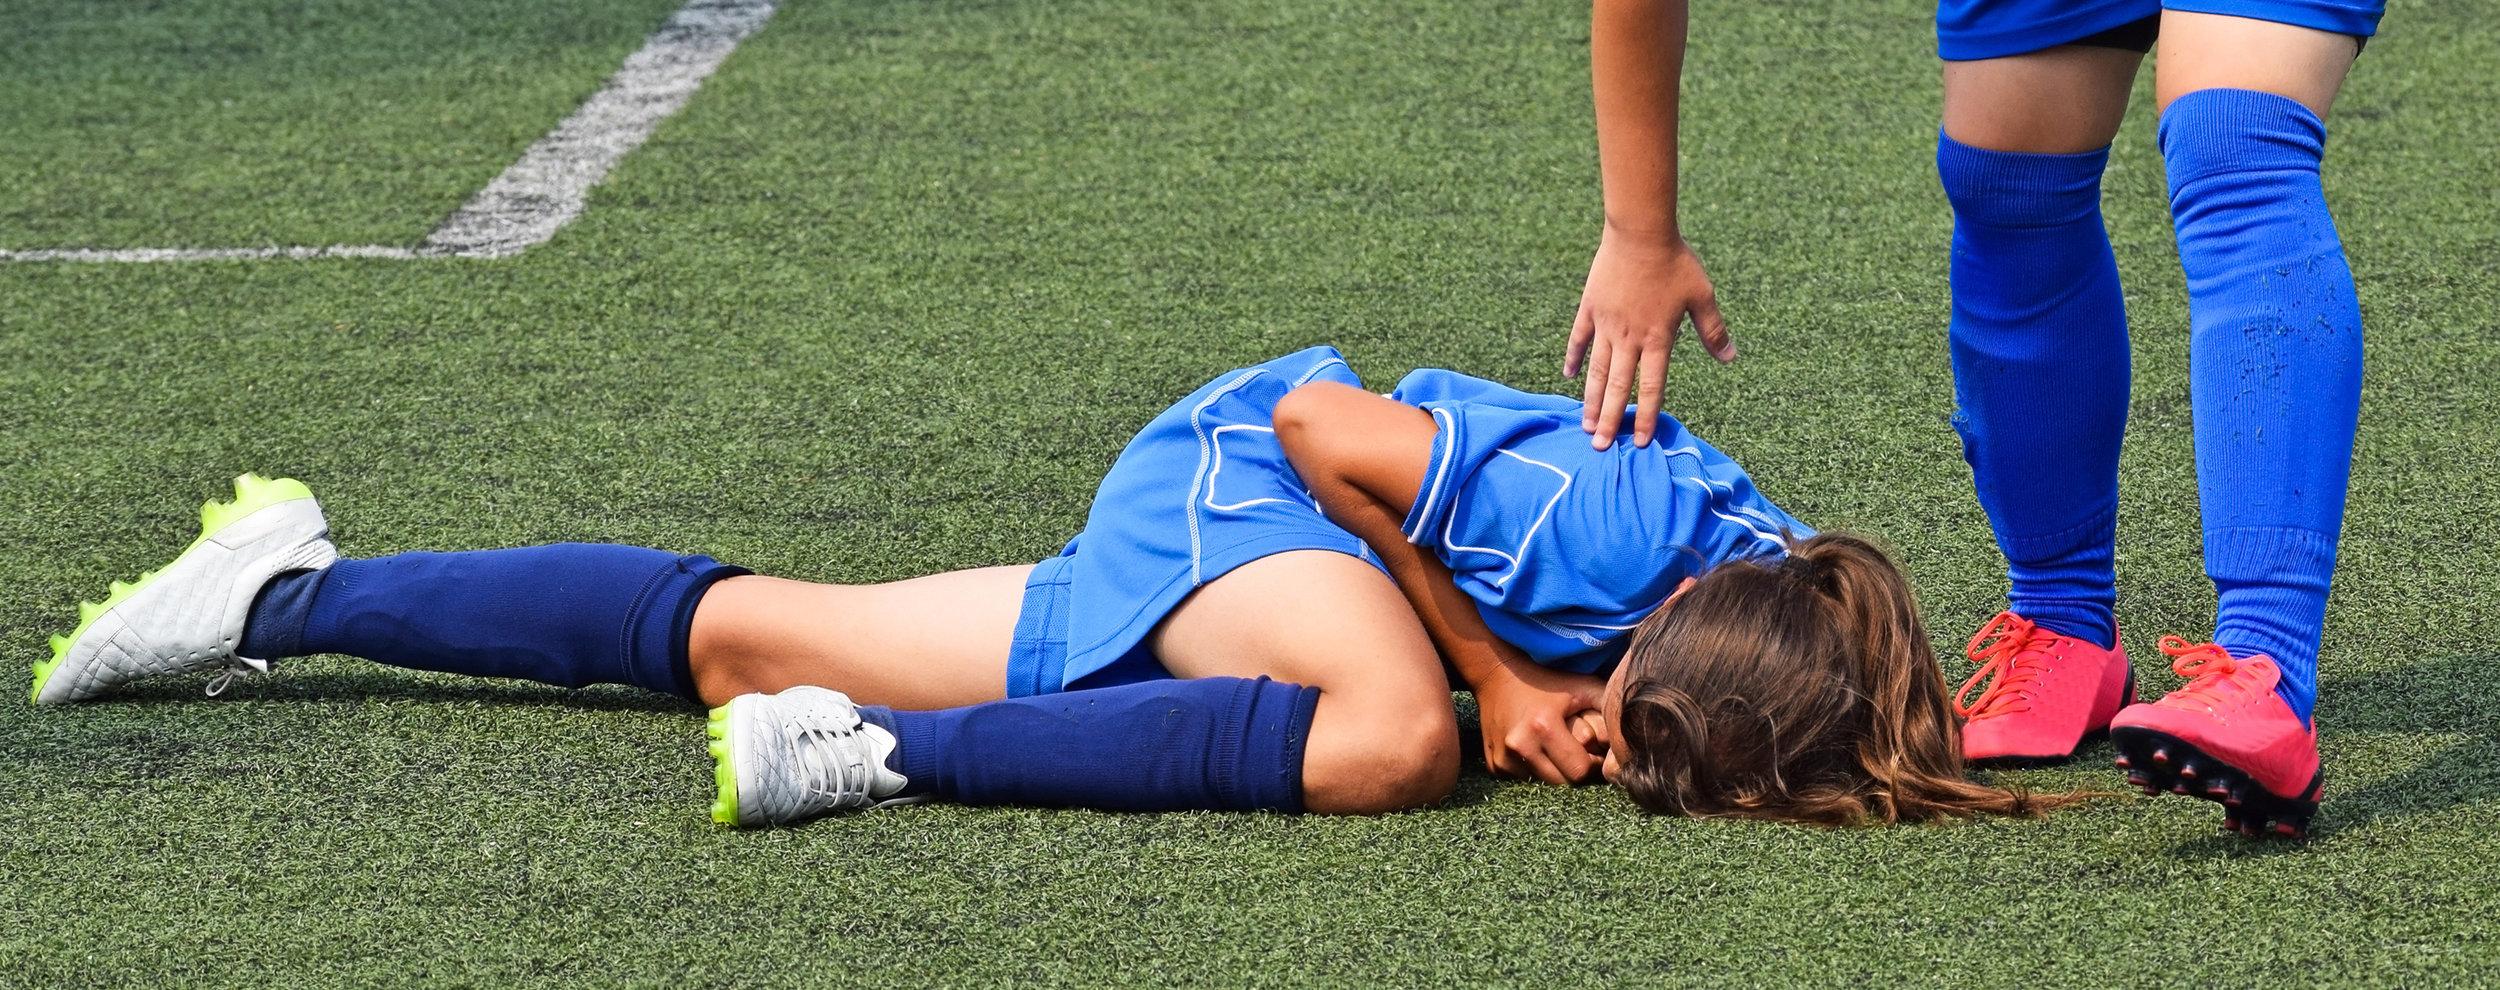 soccer_injury.jpg